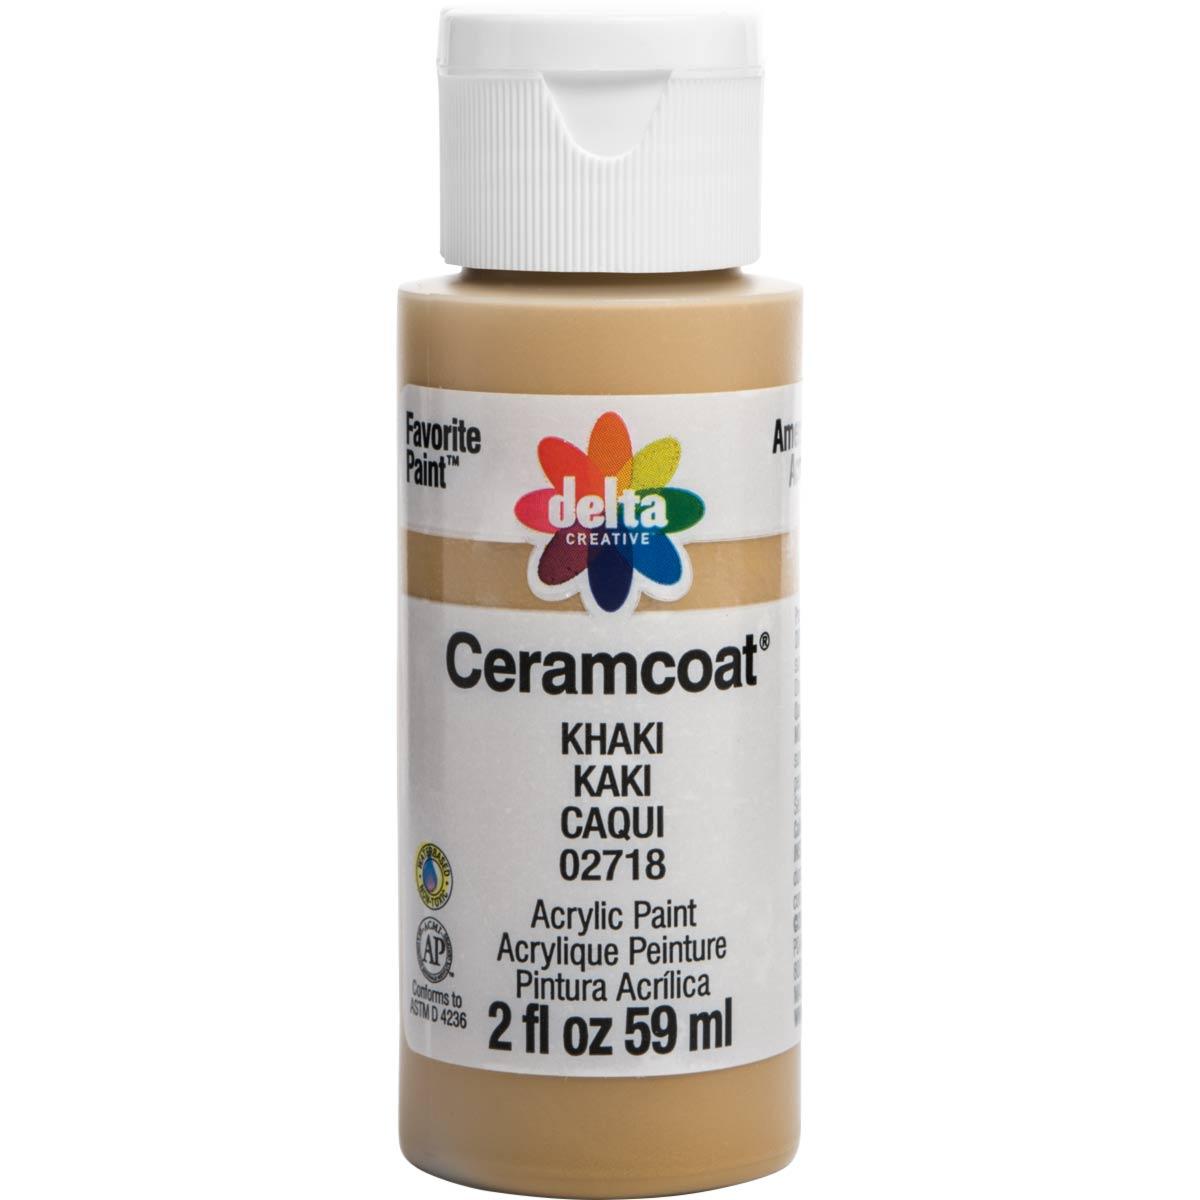 Delta Ceramcoat ® Acrylic Paint - Khaki, 2 oz. - 02718